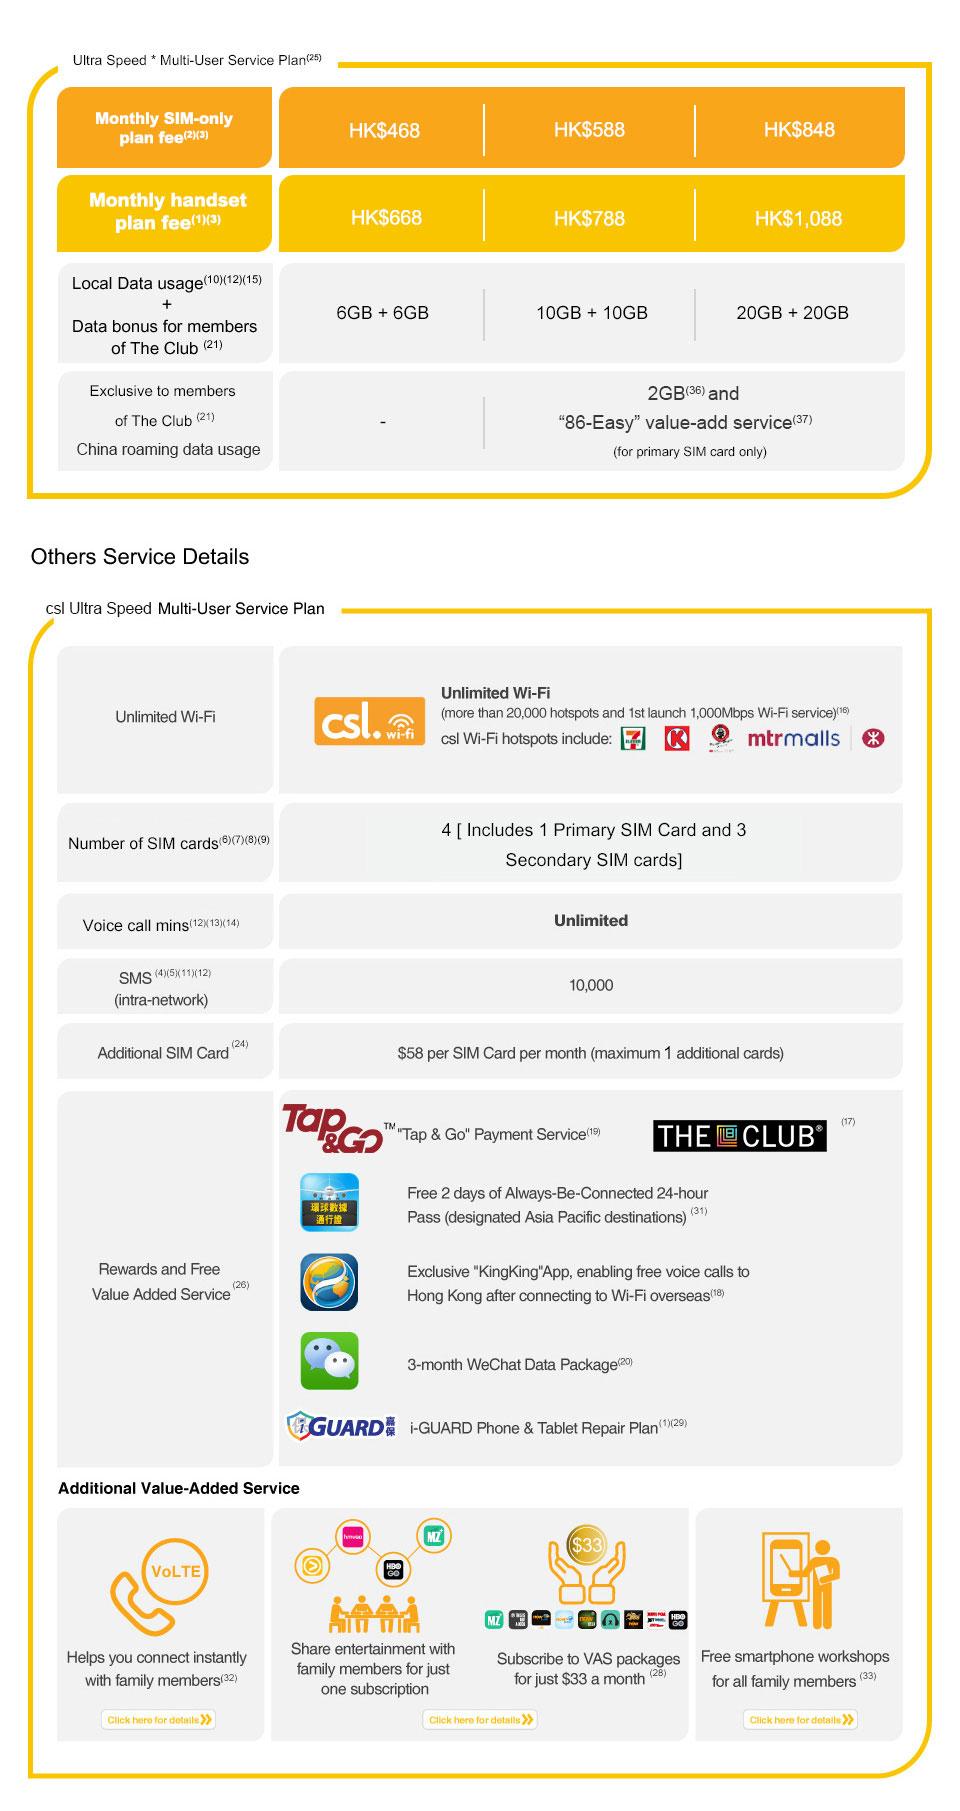 Daftar Harga Voucher 3 Three 6 Gb Terbaru 2018 Amazara Adriana Mustard Heels Merah Muda 40 Csl Ultra Speed Multi User Service Plan